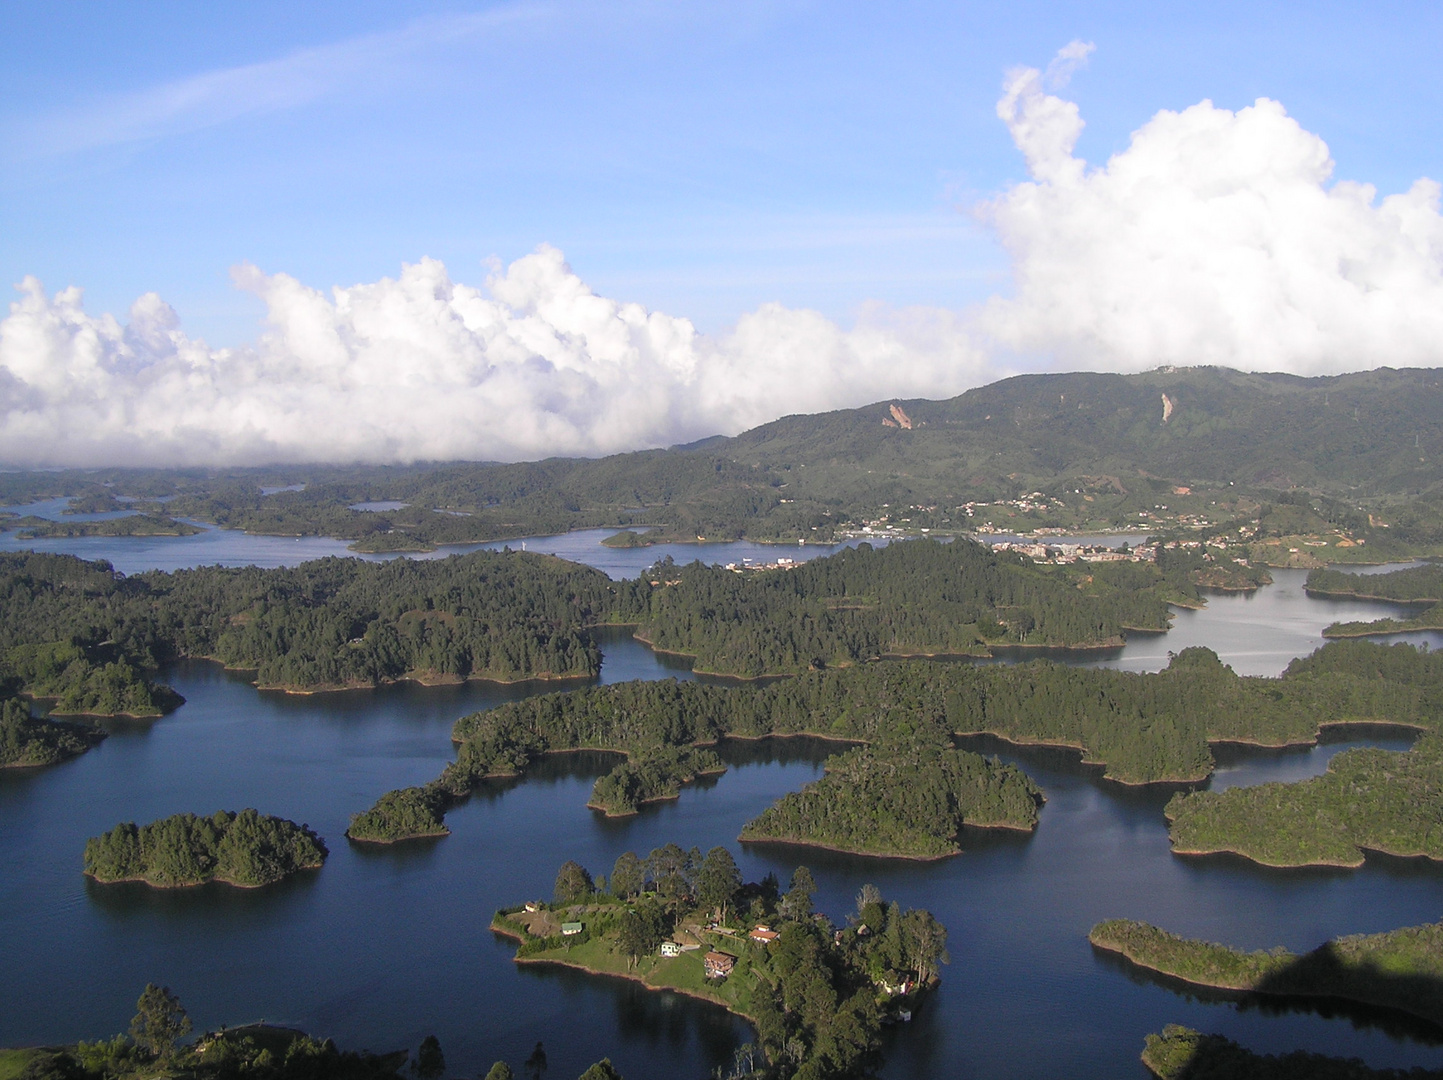 Represa del Peñol, Antioquia, Colombia